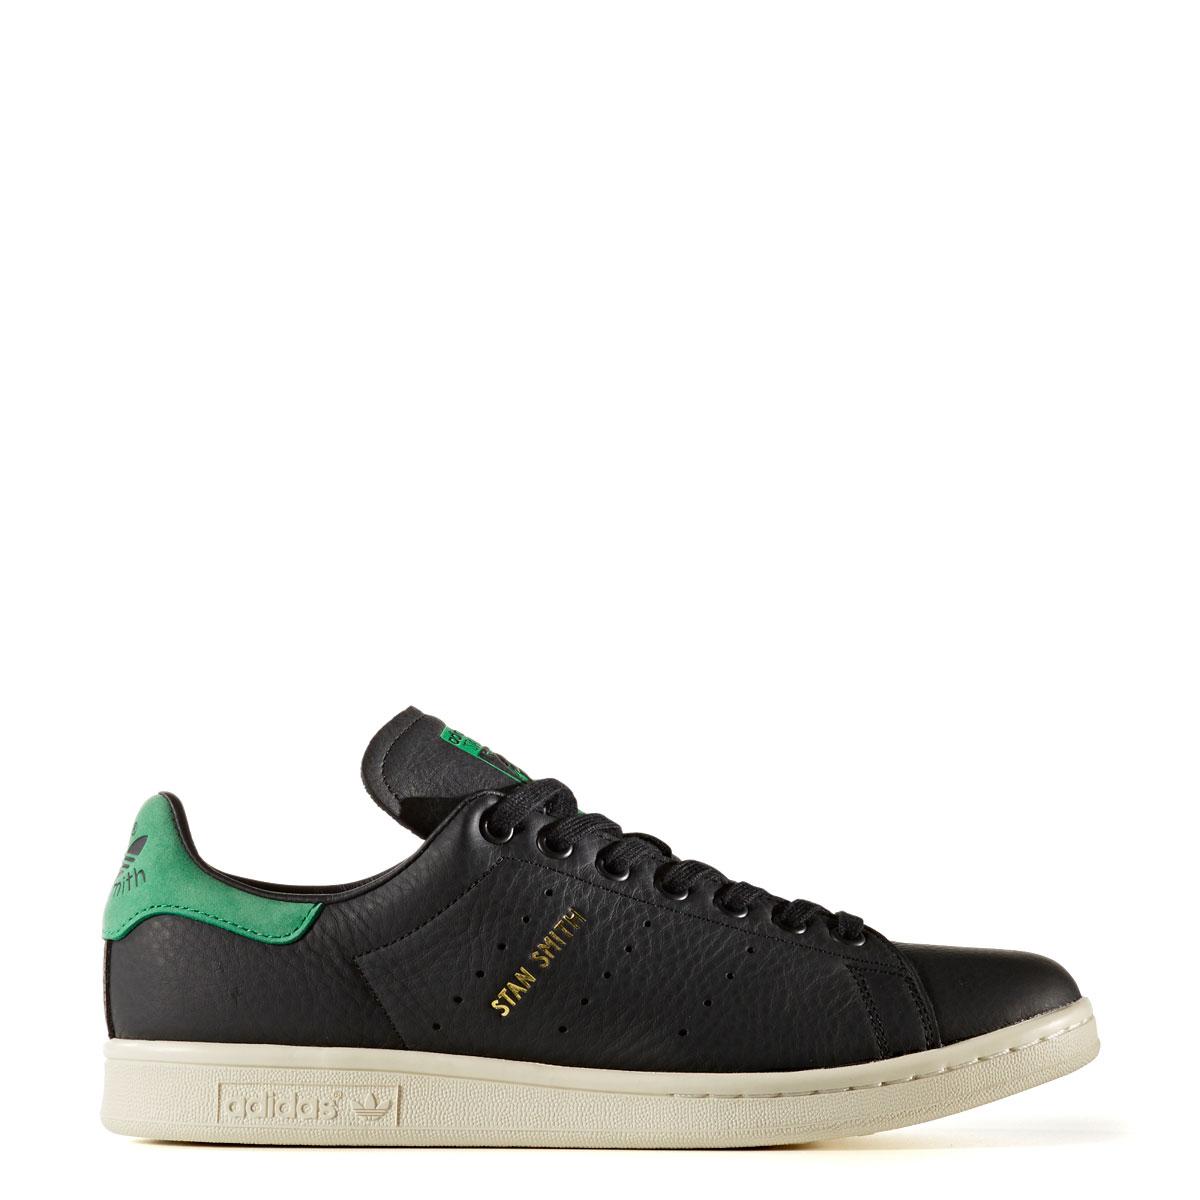 adidas Originals STAN SMITH (アディダス オリジナルス スタン スミス) CORE BLACK/CORE BLACK/GREEN【メンズ レディース スニーカー】17FW-I